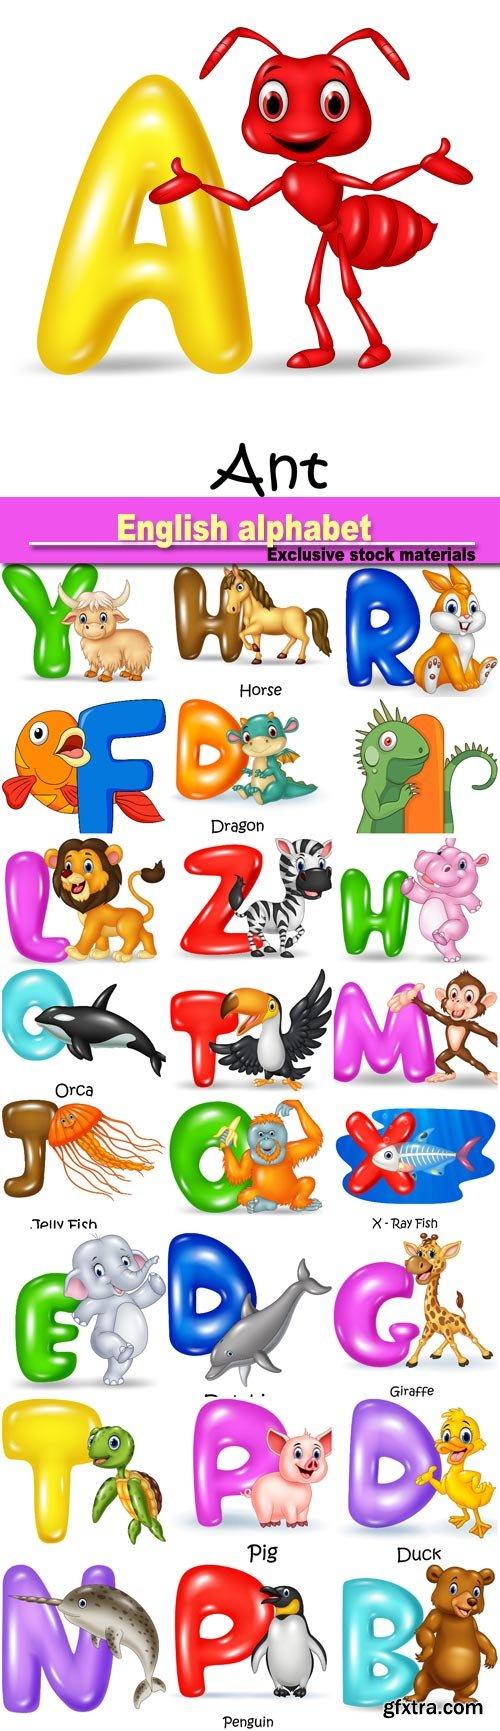 English alphabet with cartoon animals